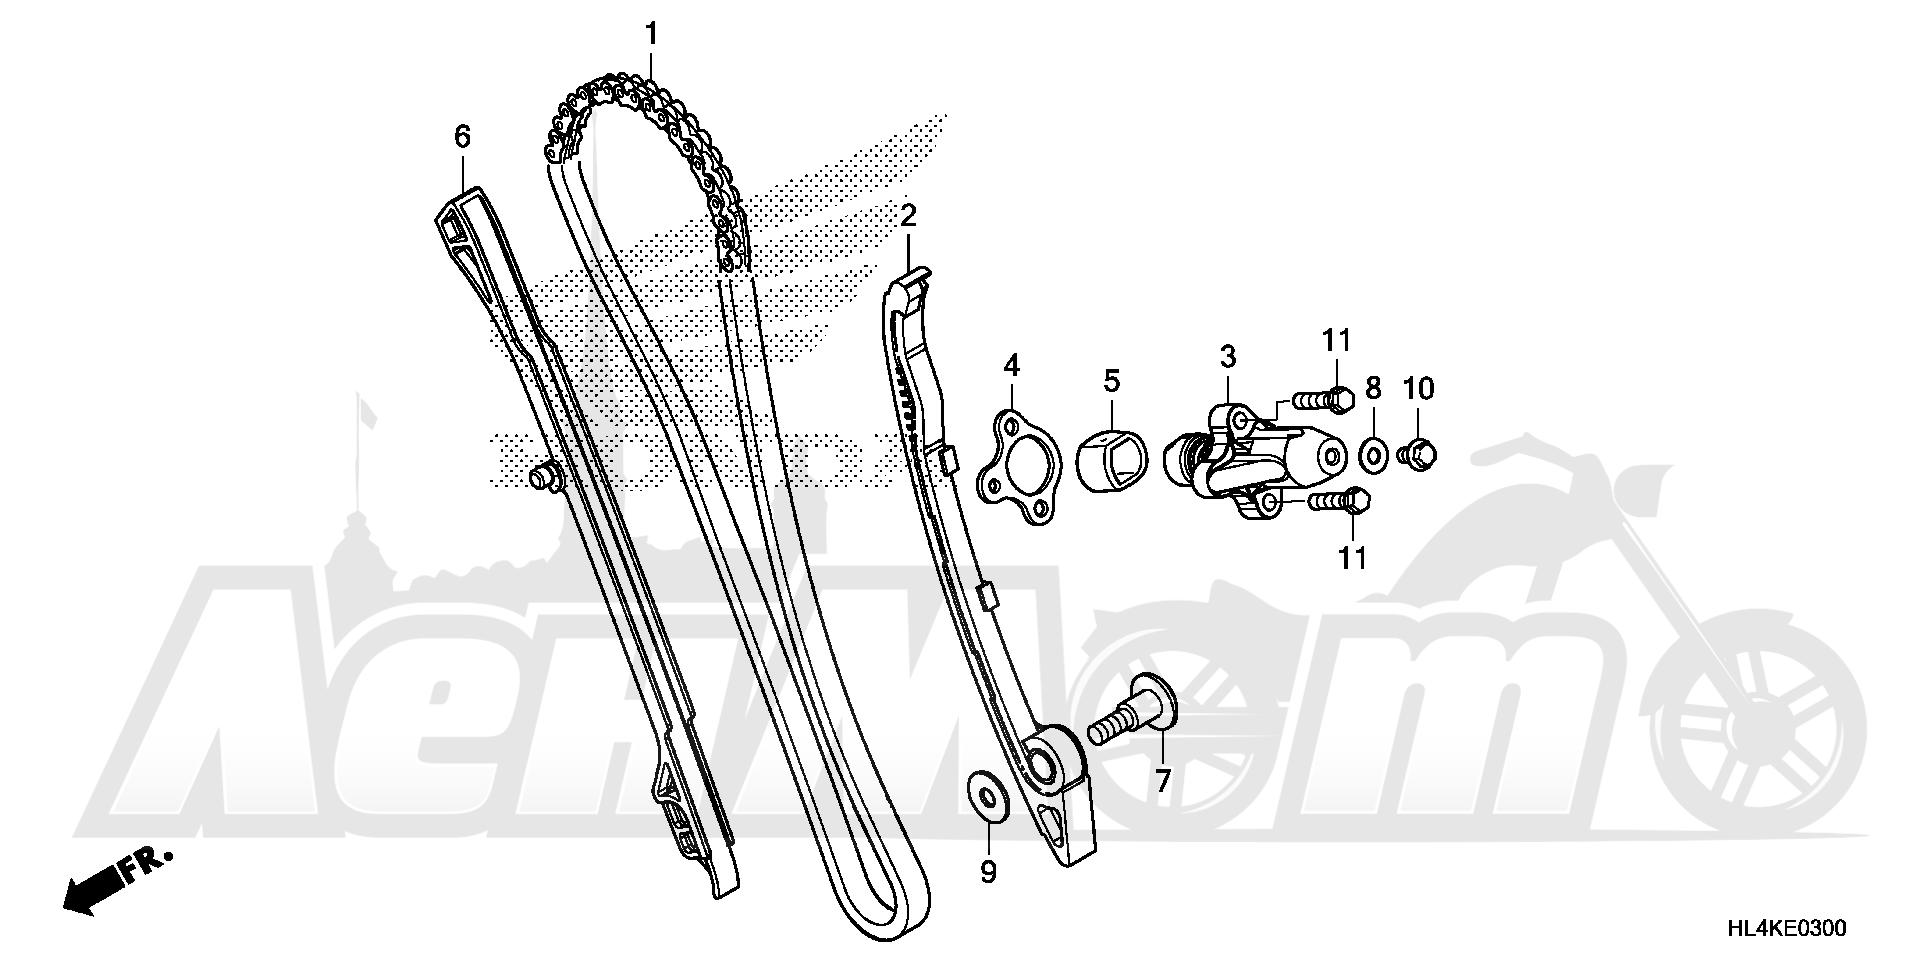 Запчасти для Квадроцикла Honda 2019 SXS1000M3L Раздел: CAM CHAIN AND TENSIONER | цепь грм и натяжитель